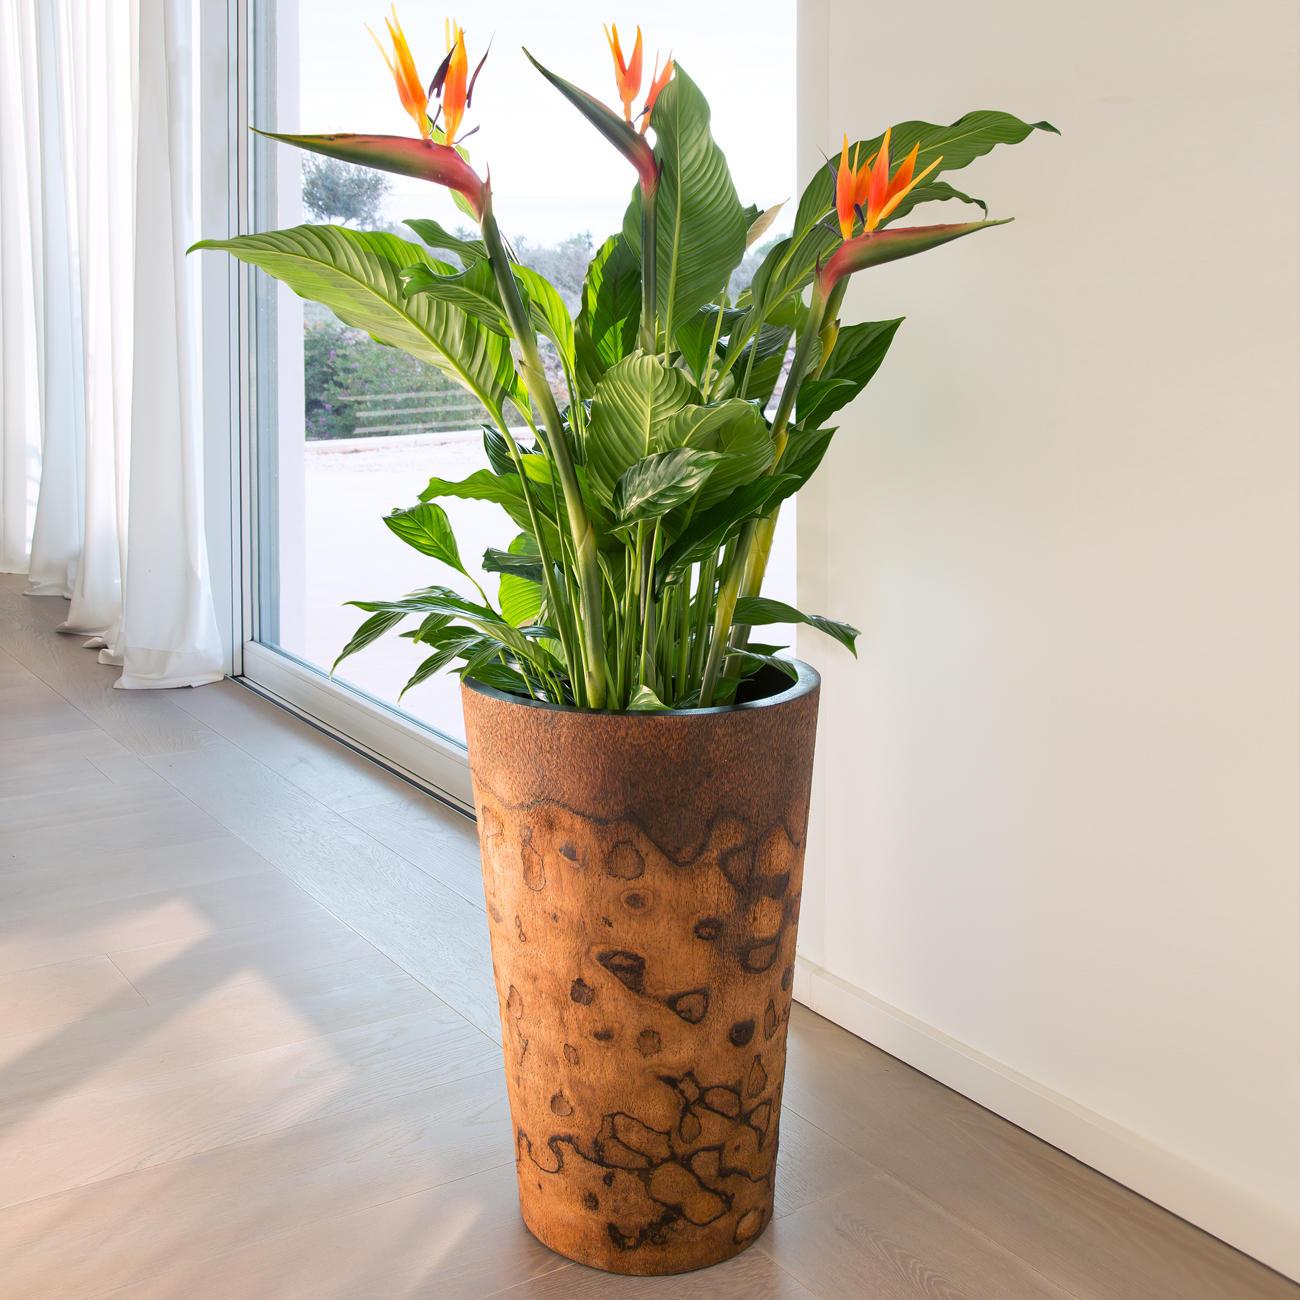 palmholz pflanztopf 3 jahre garantie pro idee. Black Bedroom Furniture Sets. Home Design Ideas